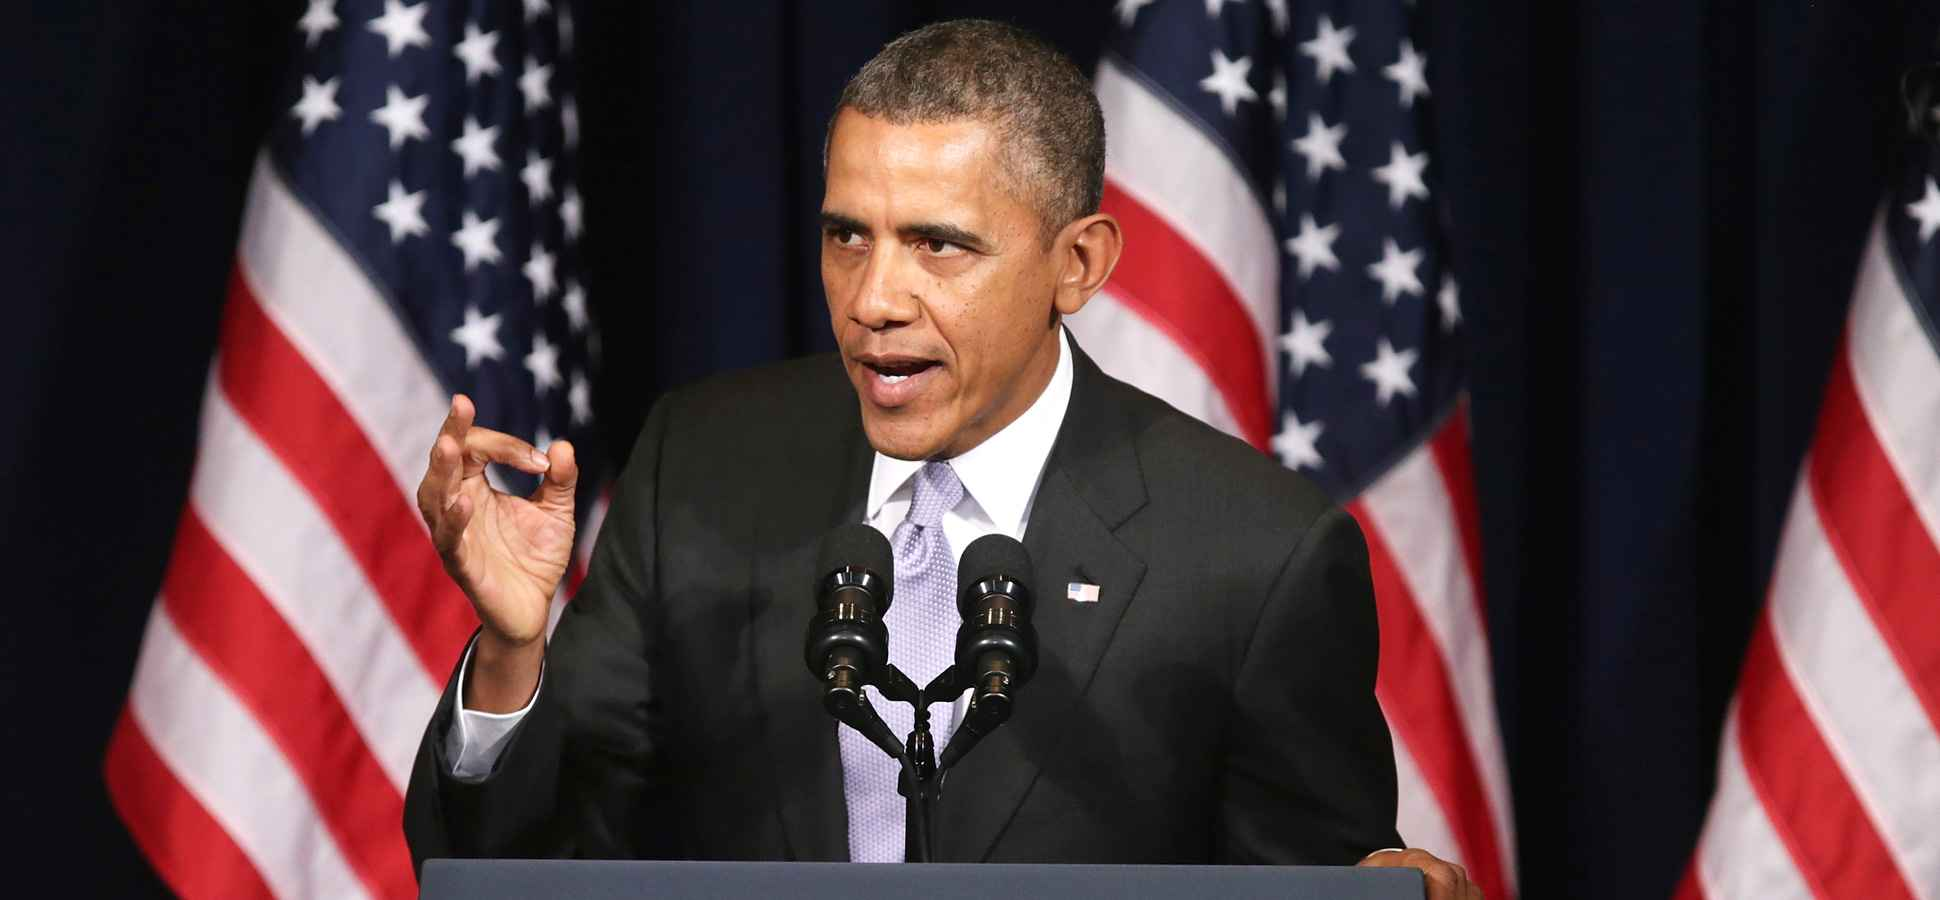 Research paper on barack obama